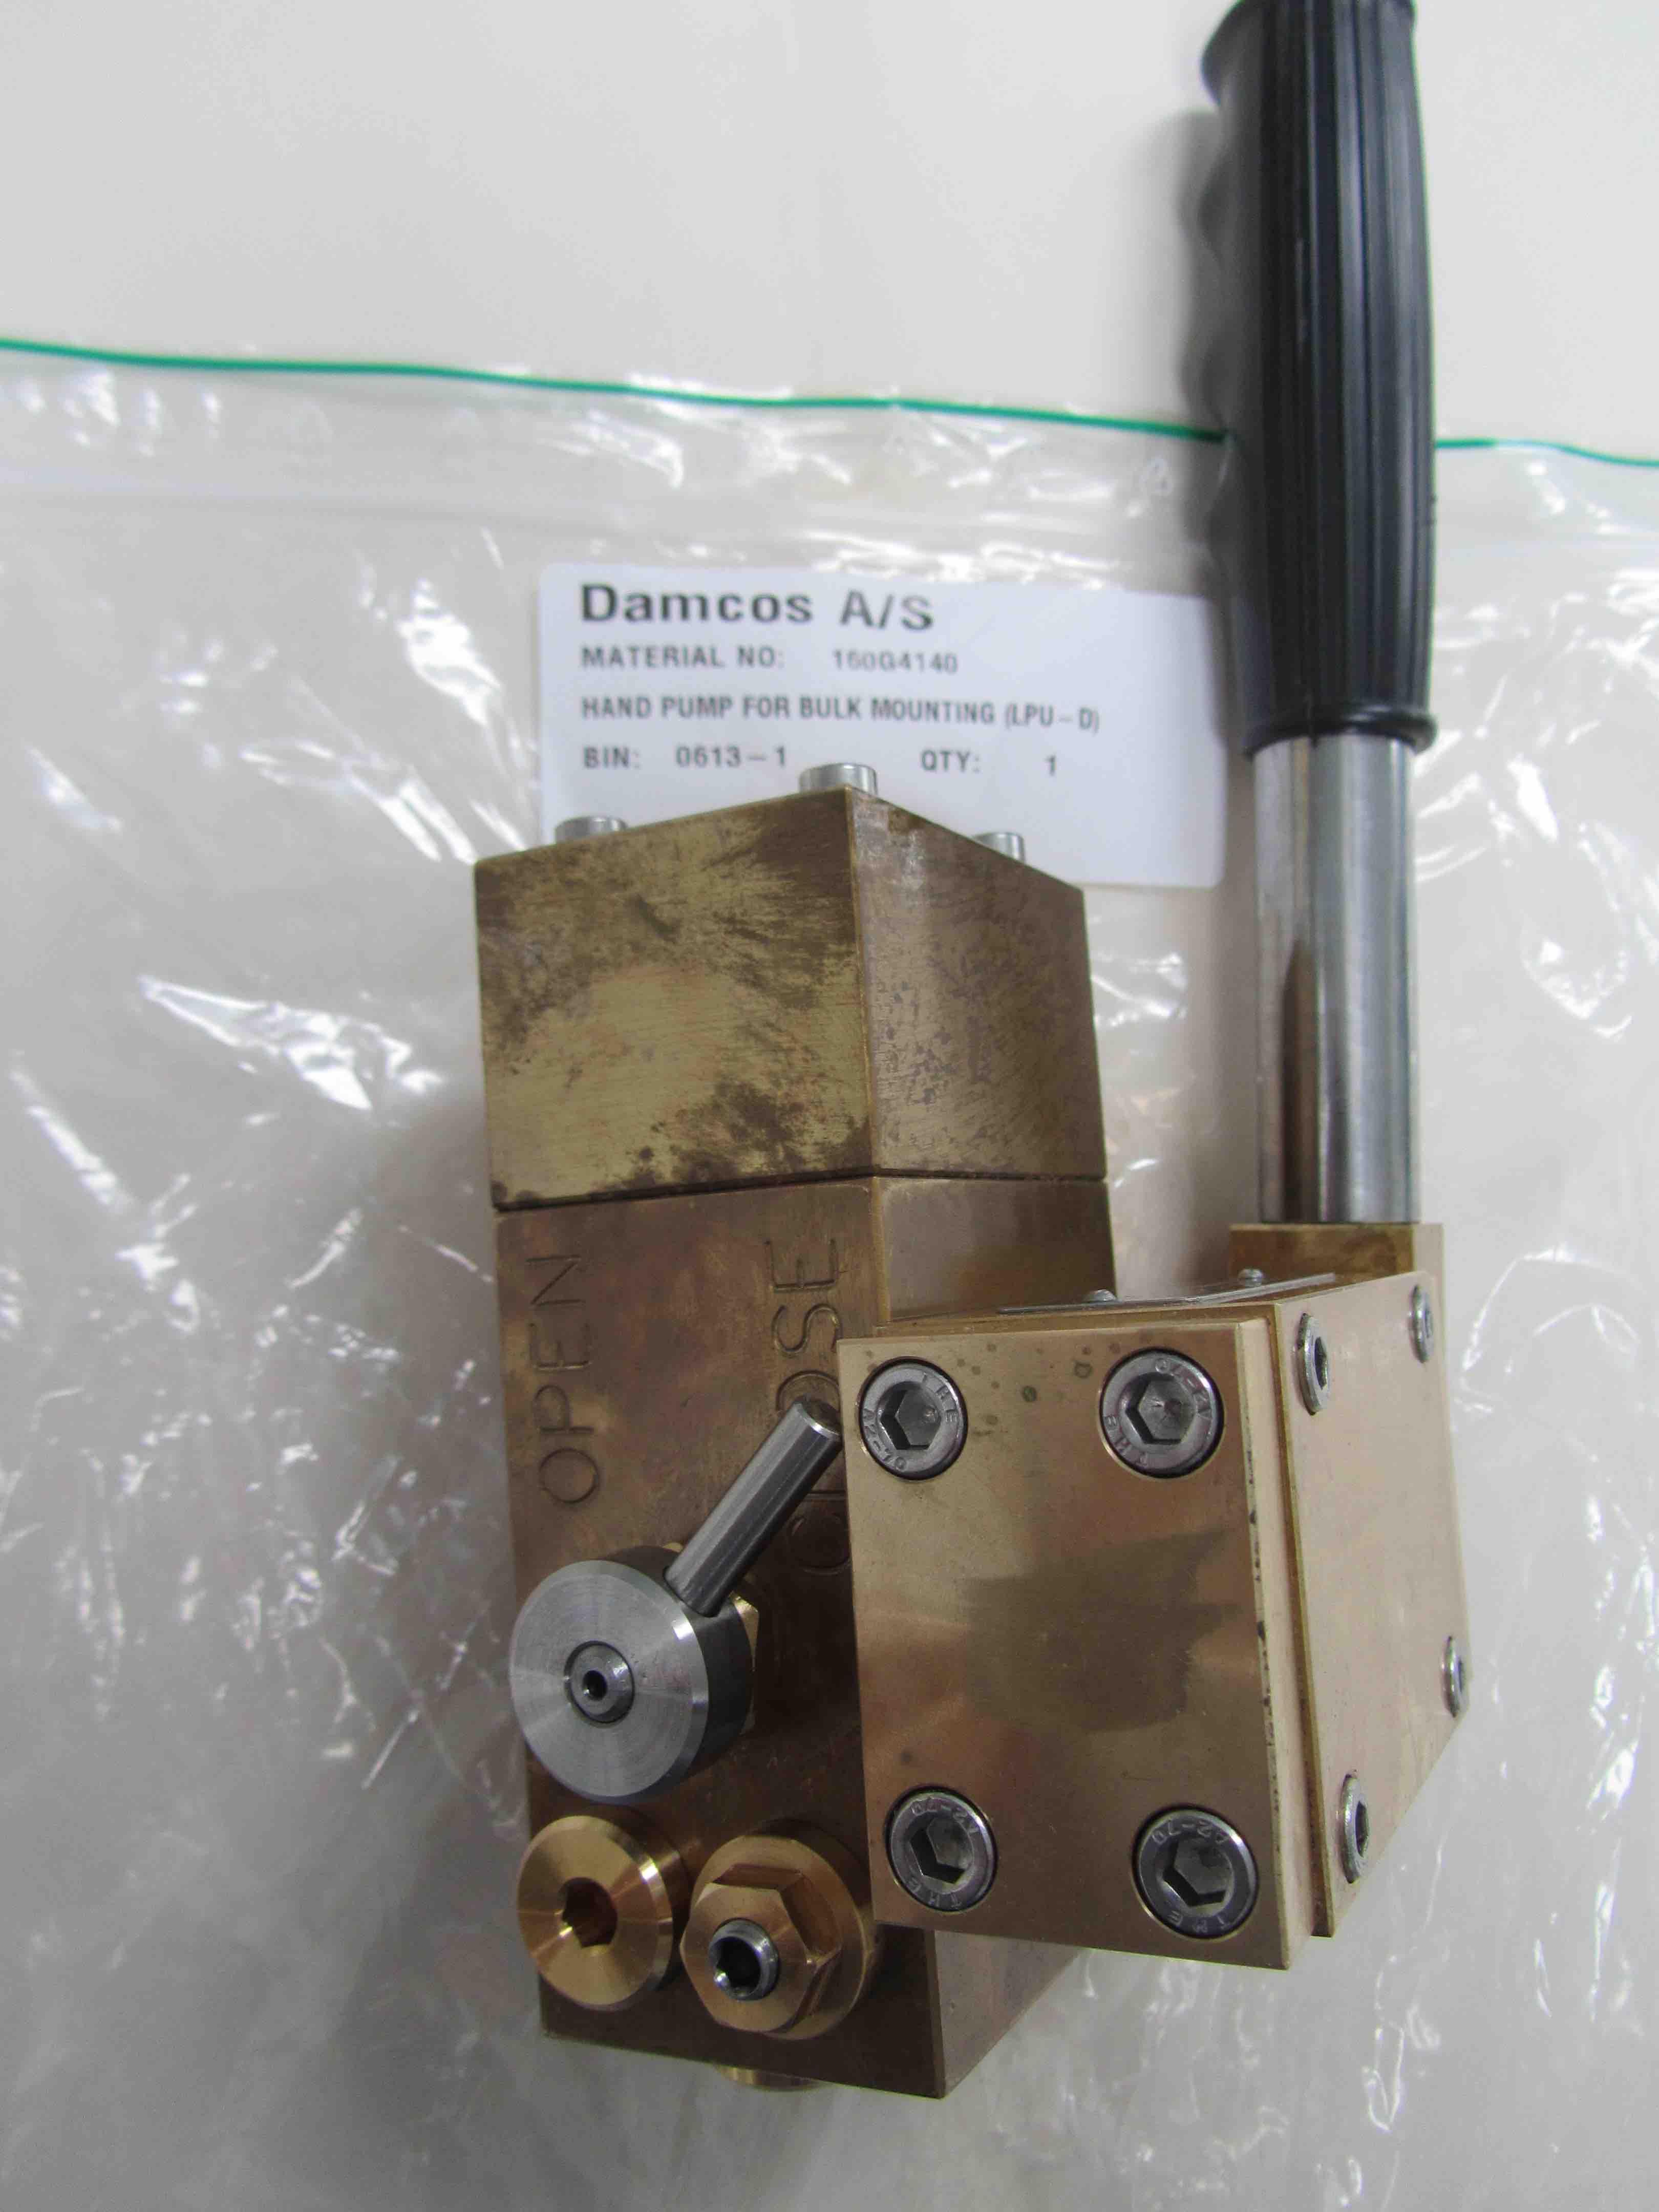 160G4140 Hand Pump for LPU-D